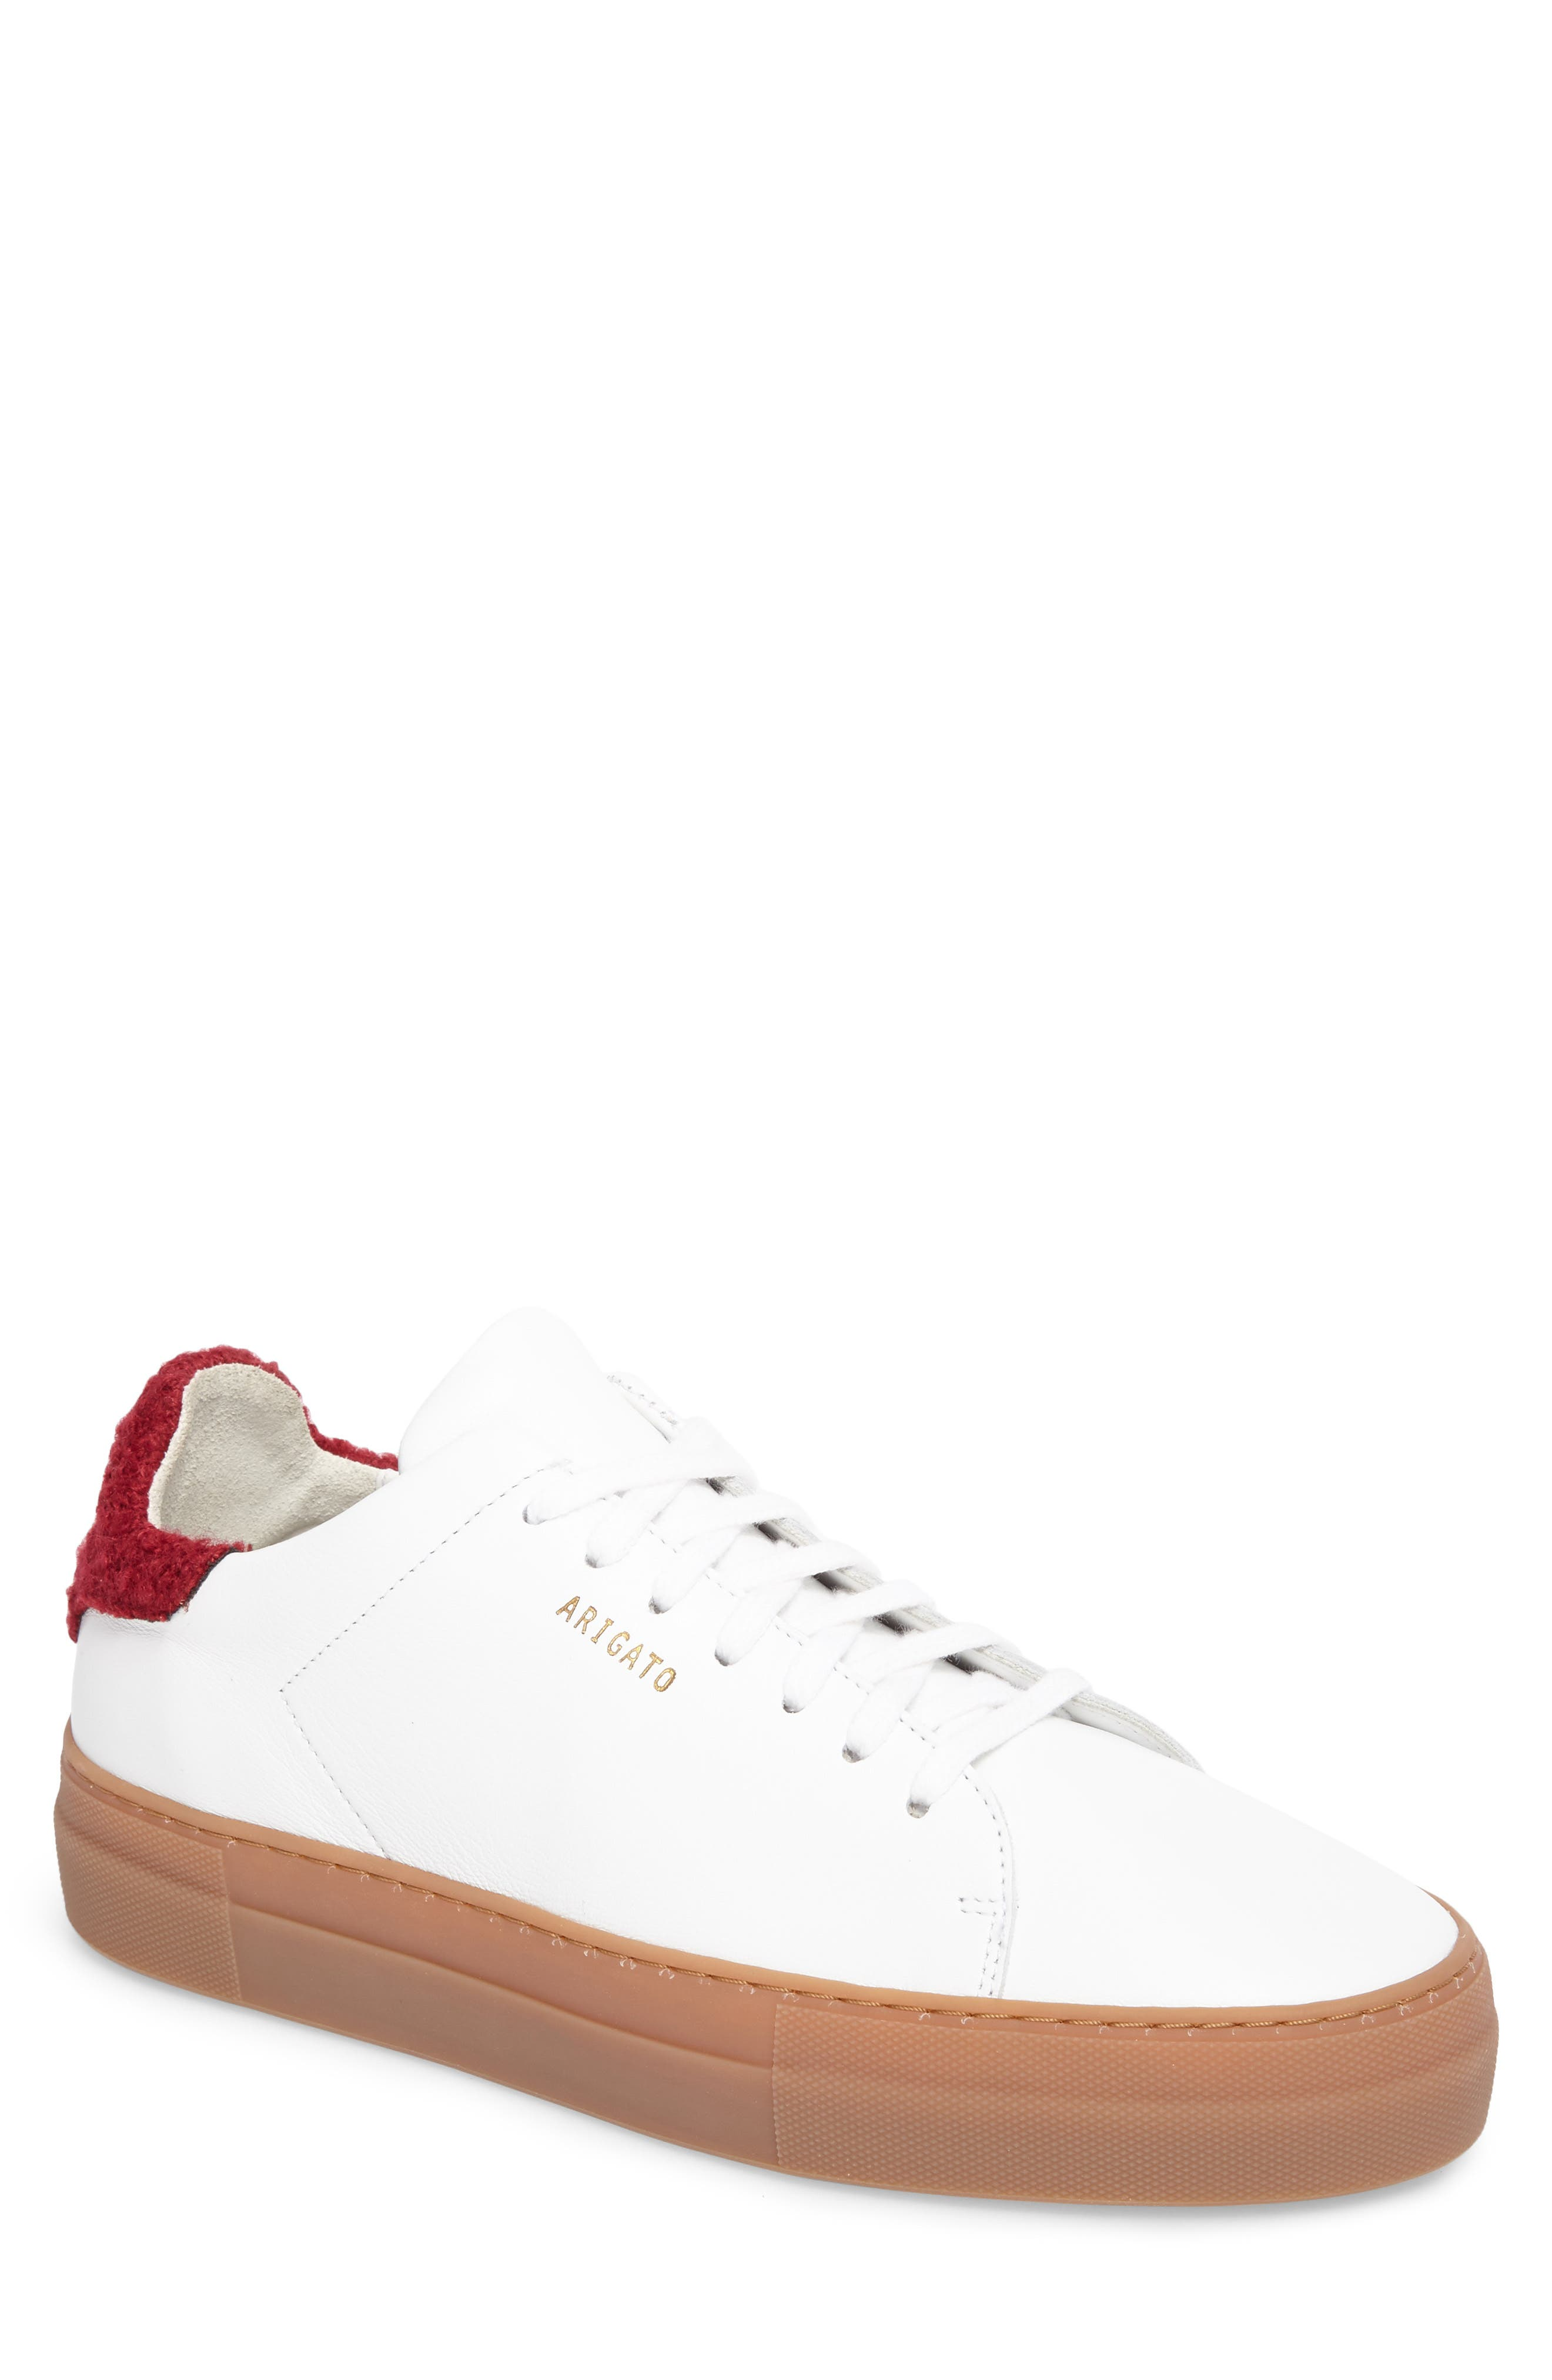 Clean 360 Fuzzy Heel Sneaker,                             Main thumbnail 1, color,                             100